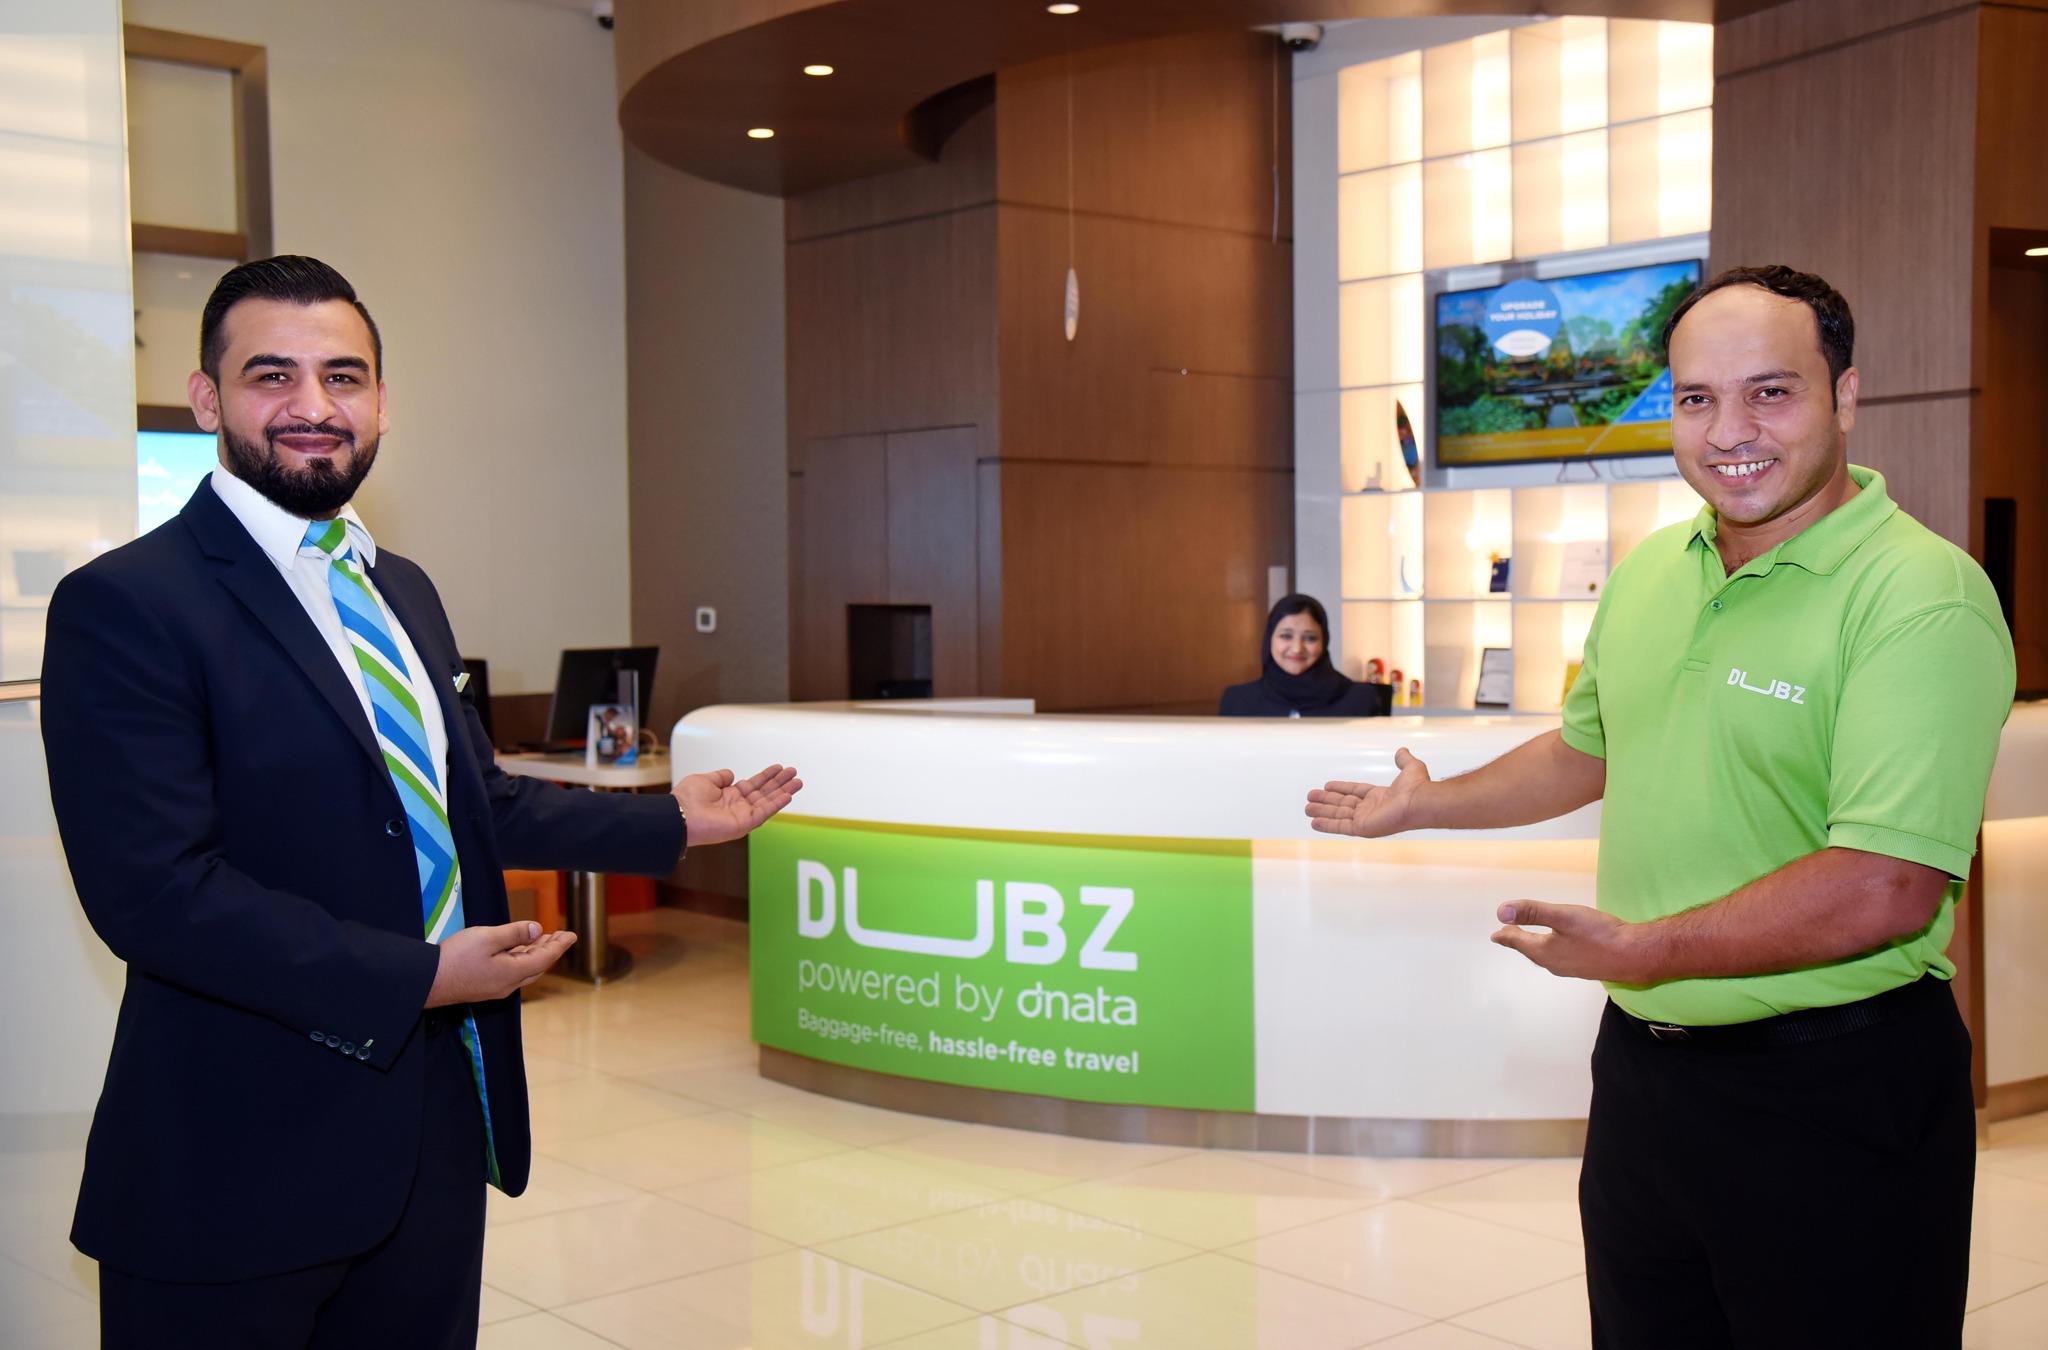 dnata's DUBZ checks in passengers for flights in The Dubai Mall